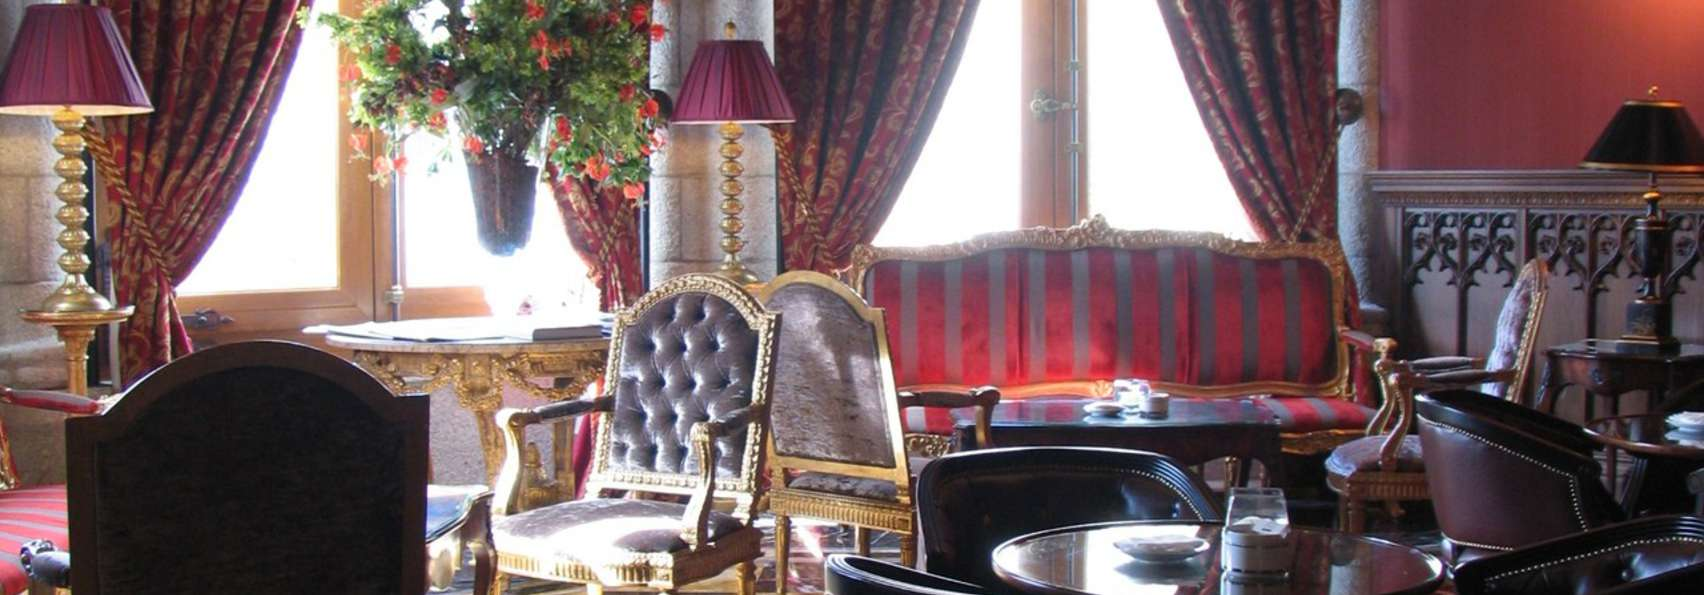 Hotel Real de Bohoyo - BOHOYO.jpg